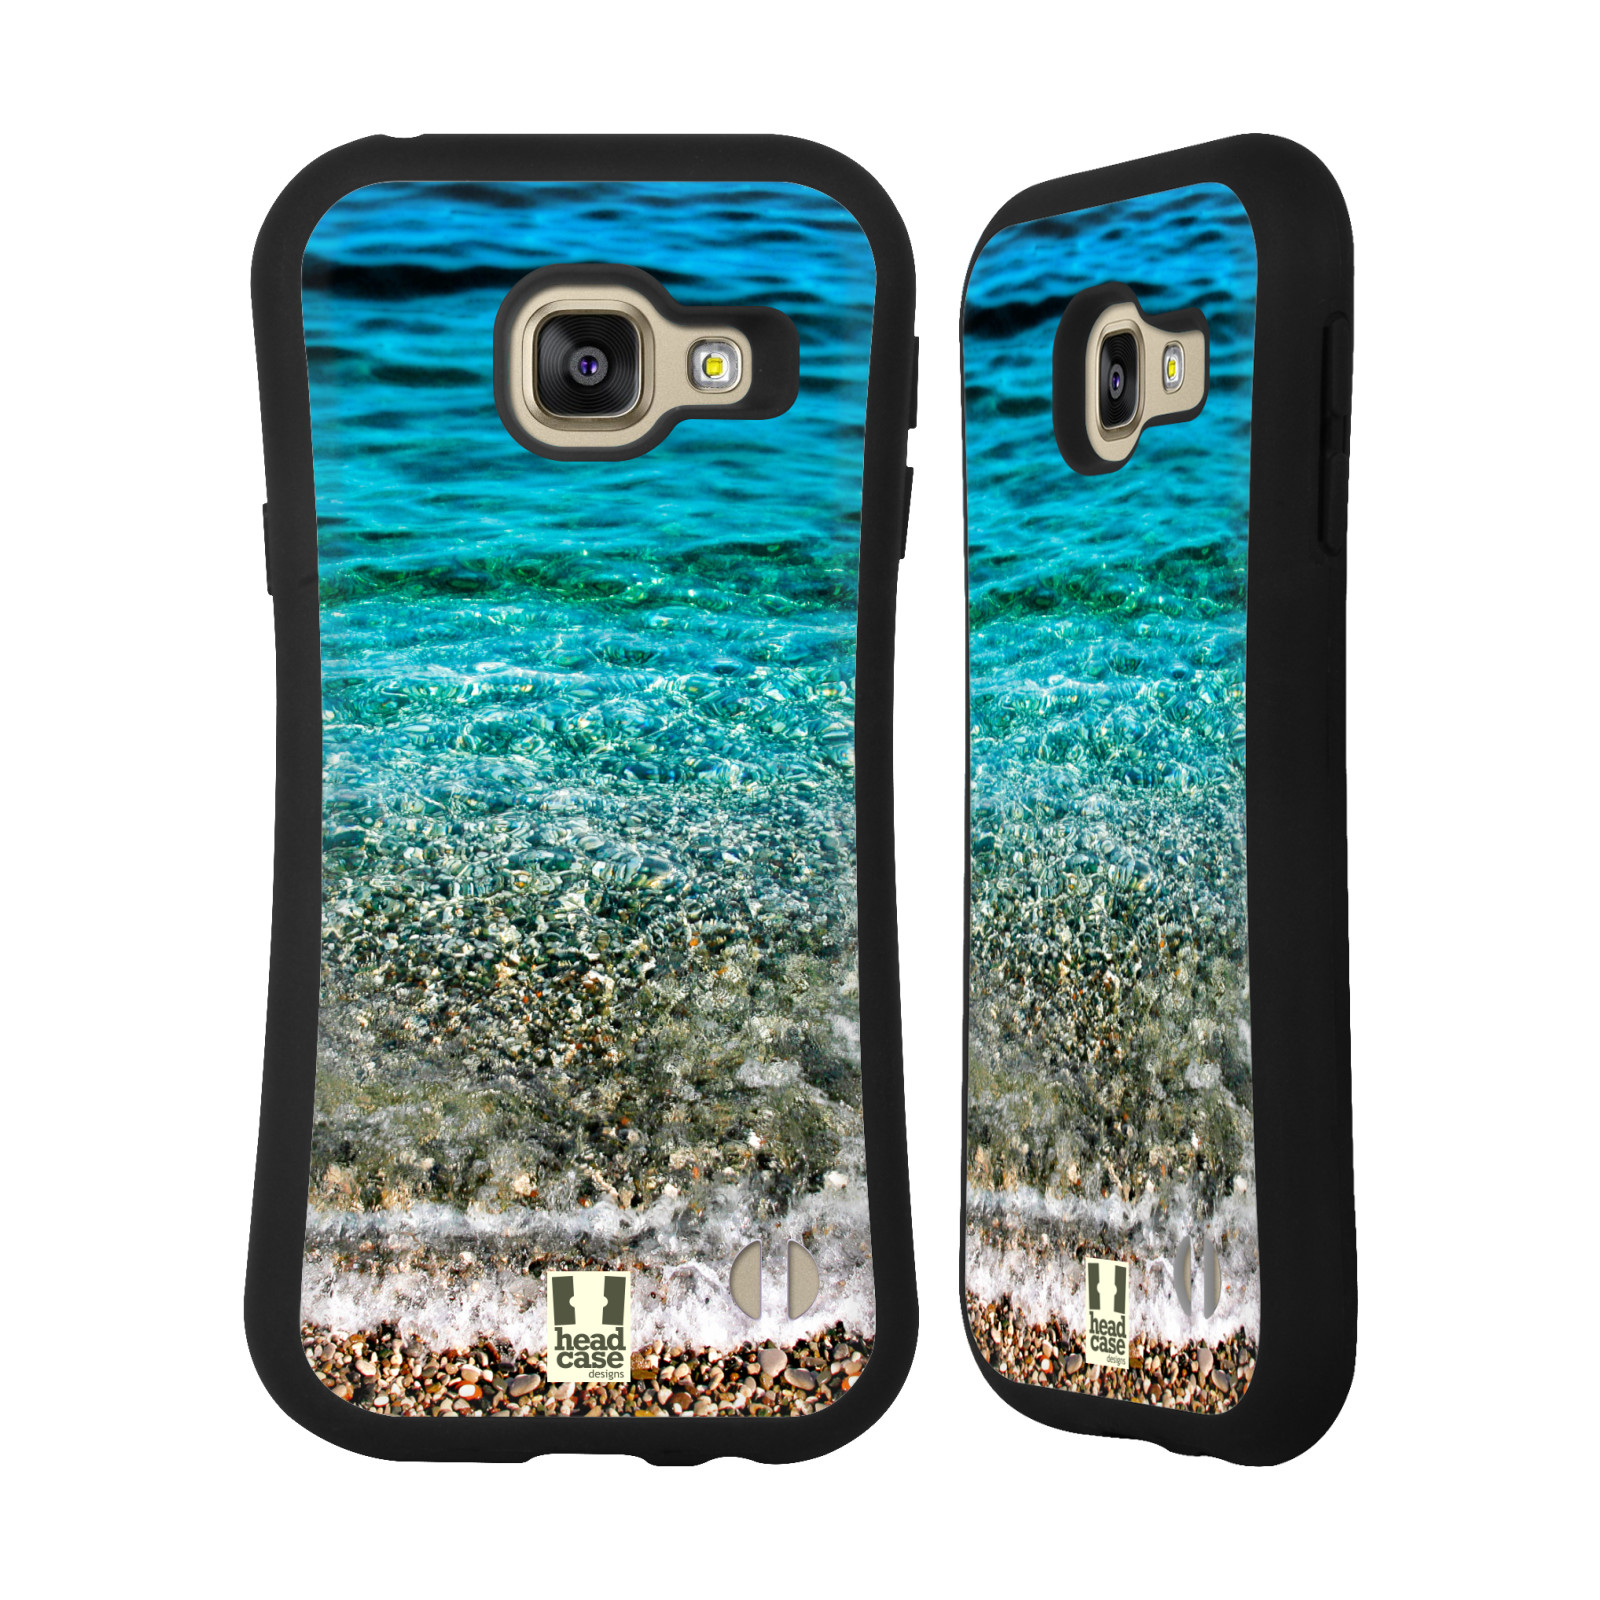 HEAD CASE silikon/plast odolný obal na mobil Samsung Galaxy A3 2016 vzor Pláže a Moře PRŮZRAČNÉ MOŘE S OBLÁZKY